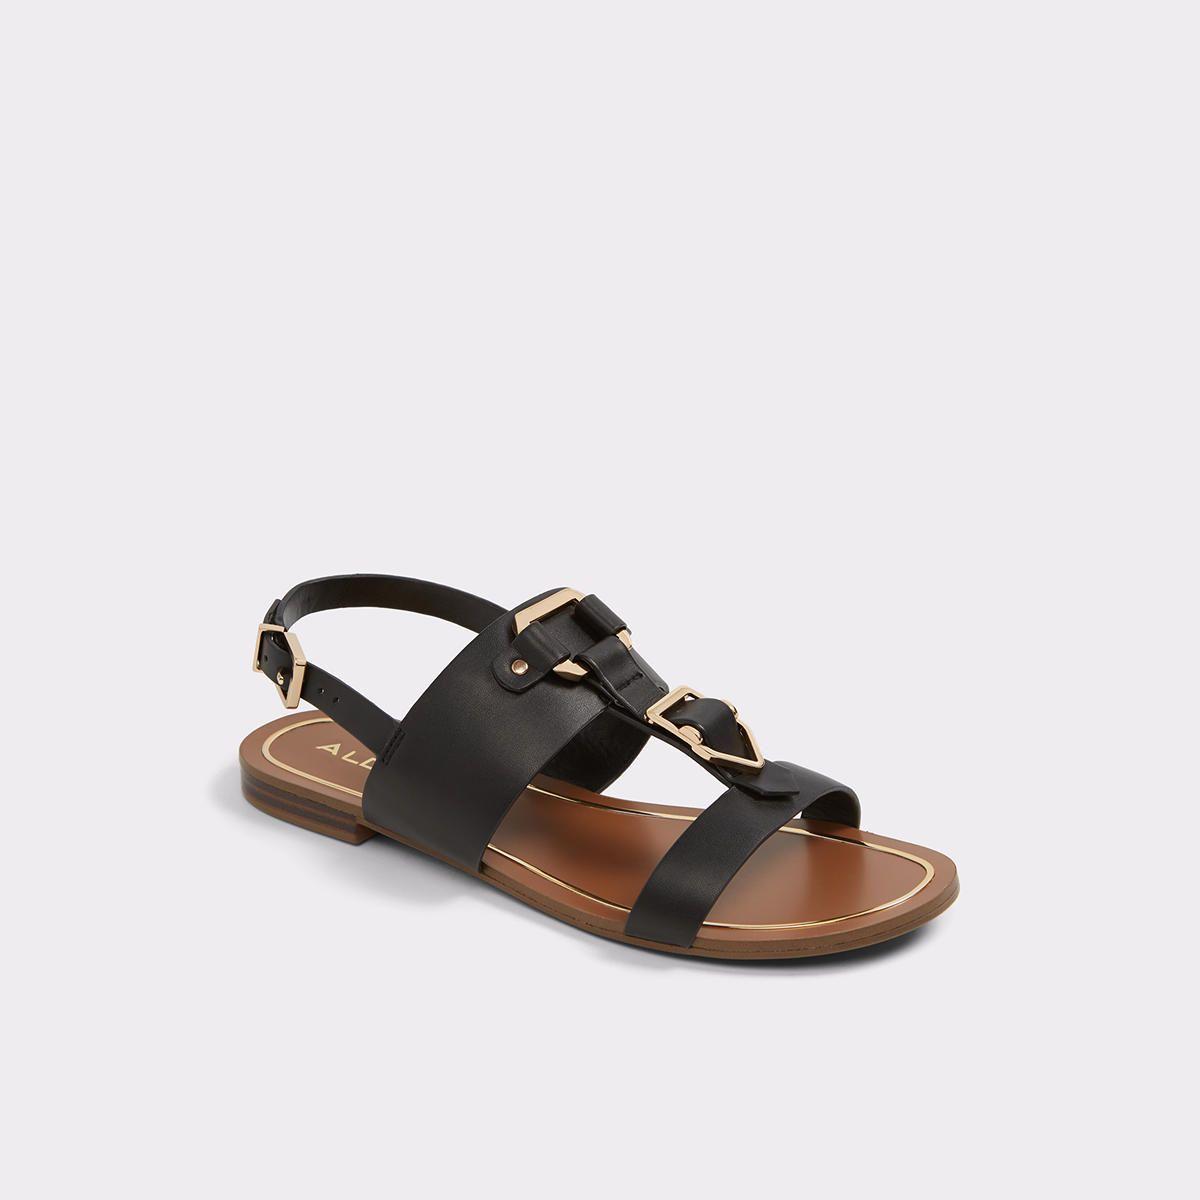 7b19b57ddd42 Afiarien Style up your beach-bound wardrobe with this slingback flat sandal